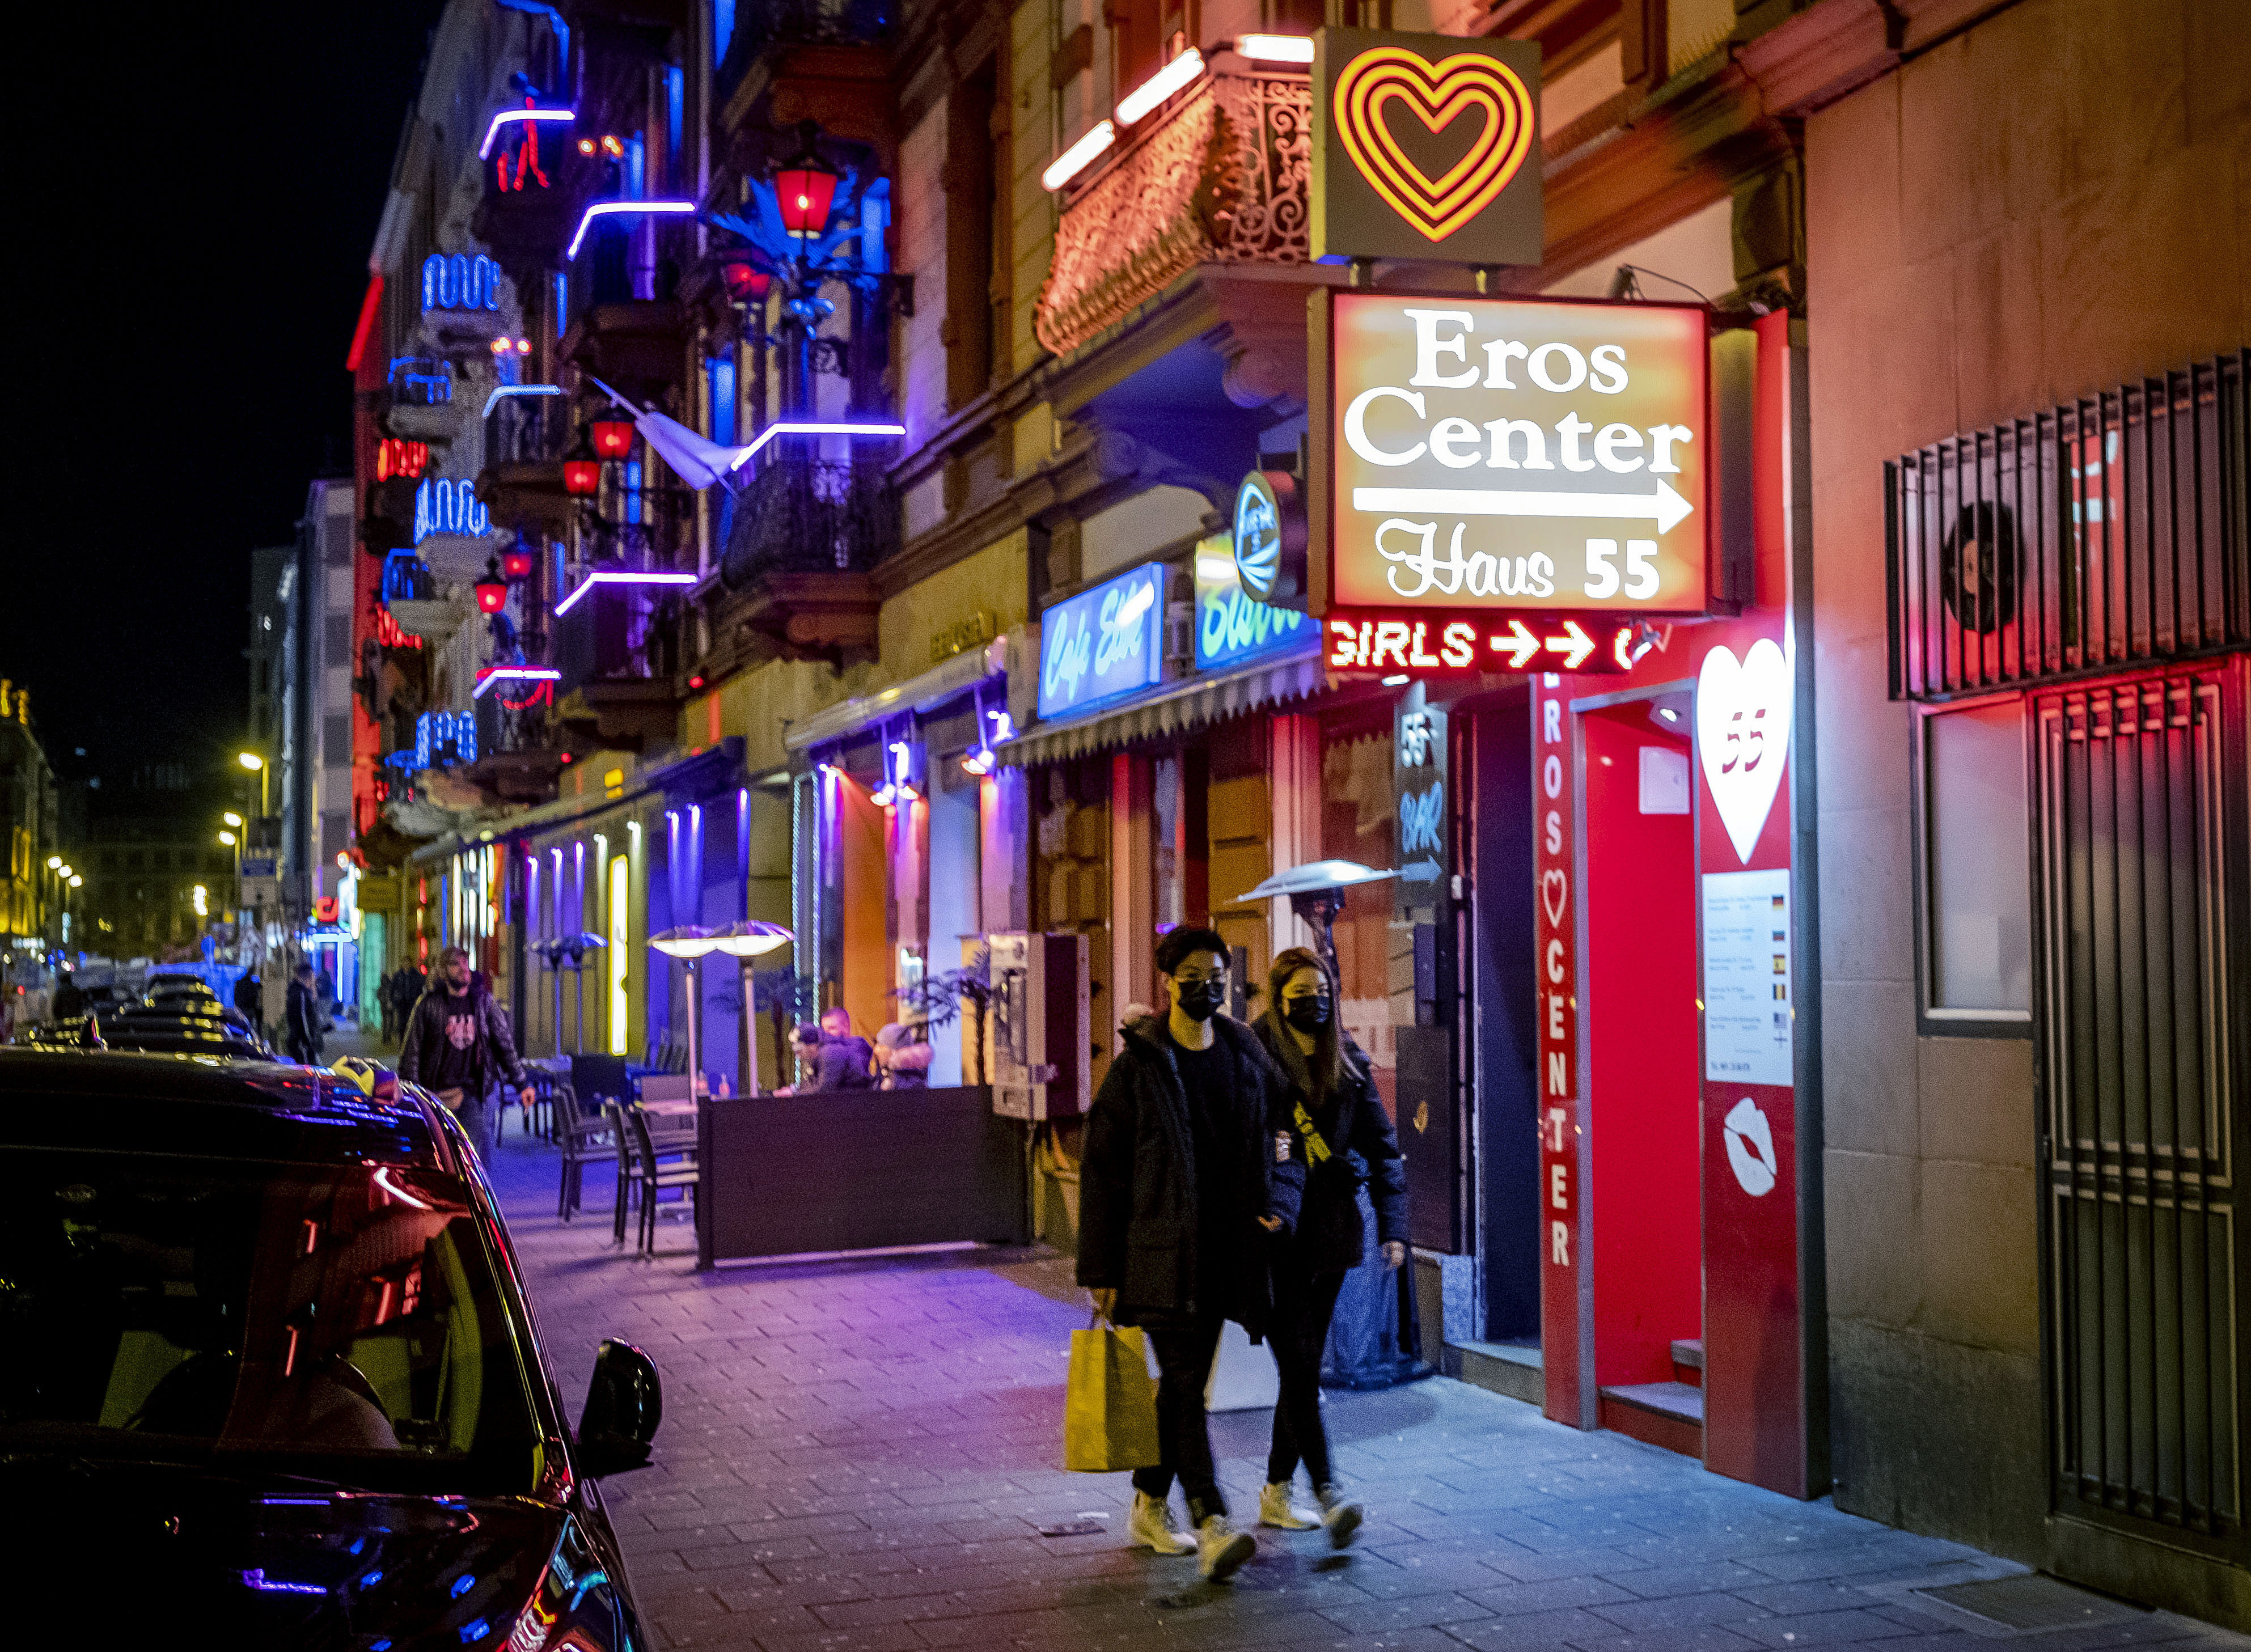 In albany ny prostitutes Prostitution problems